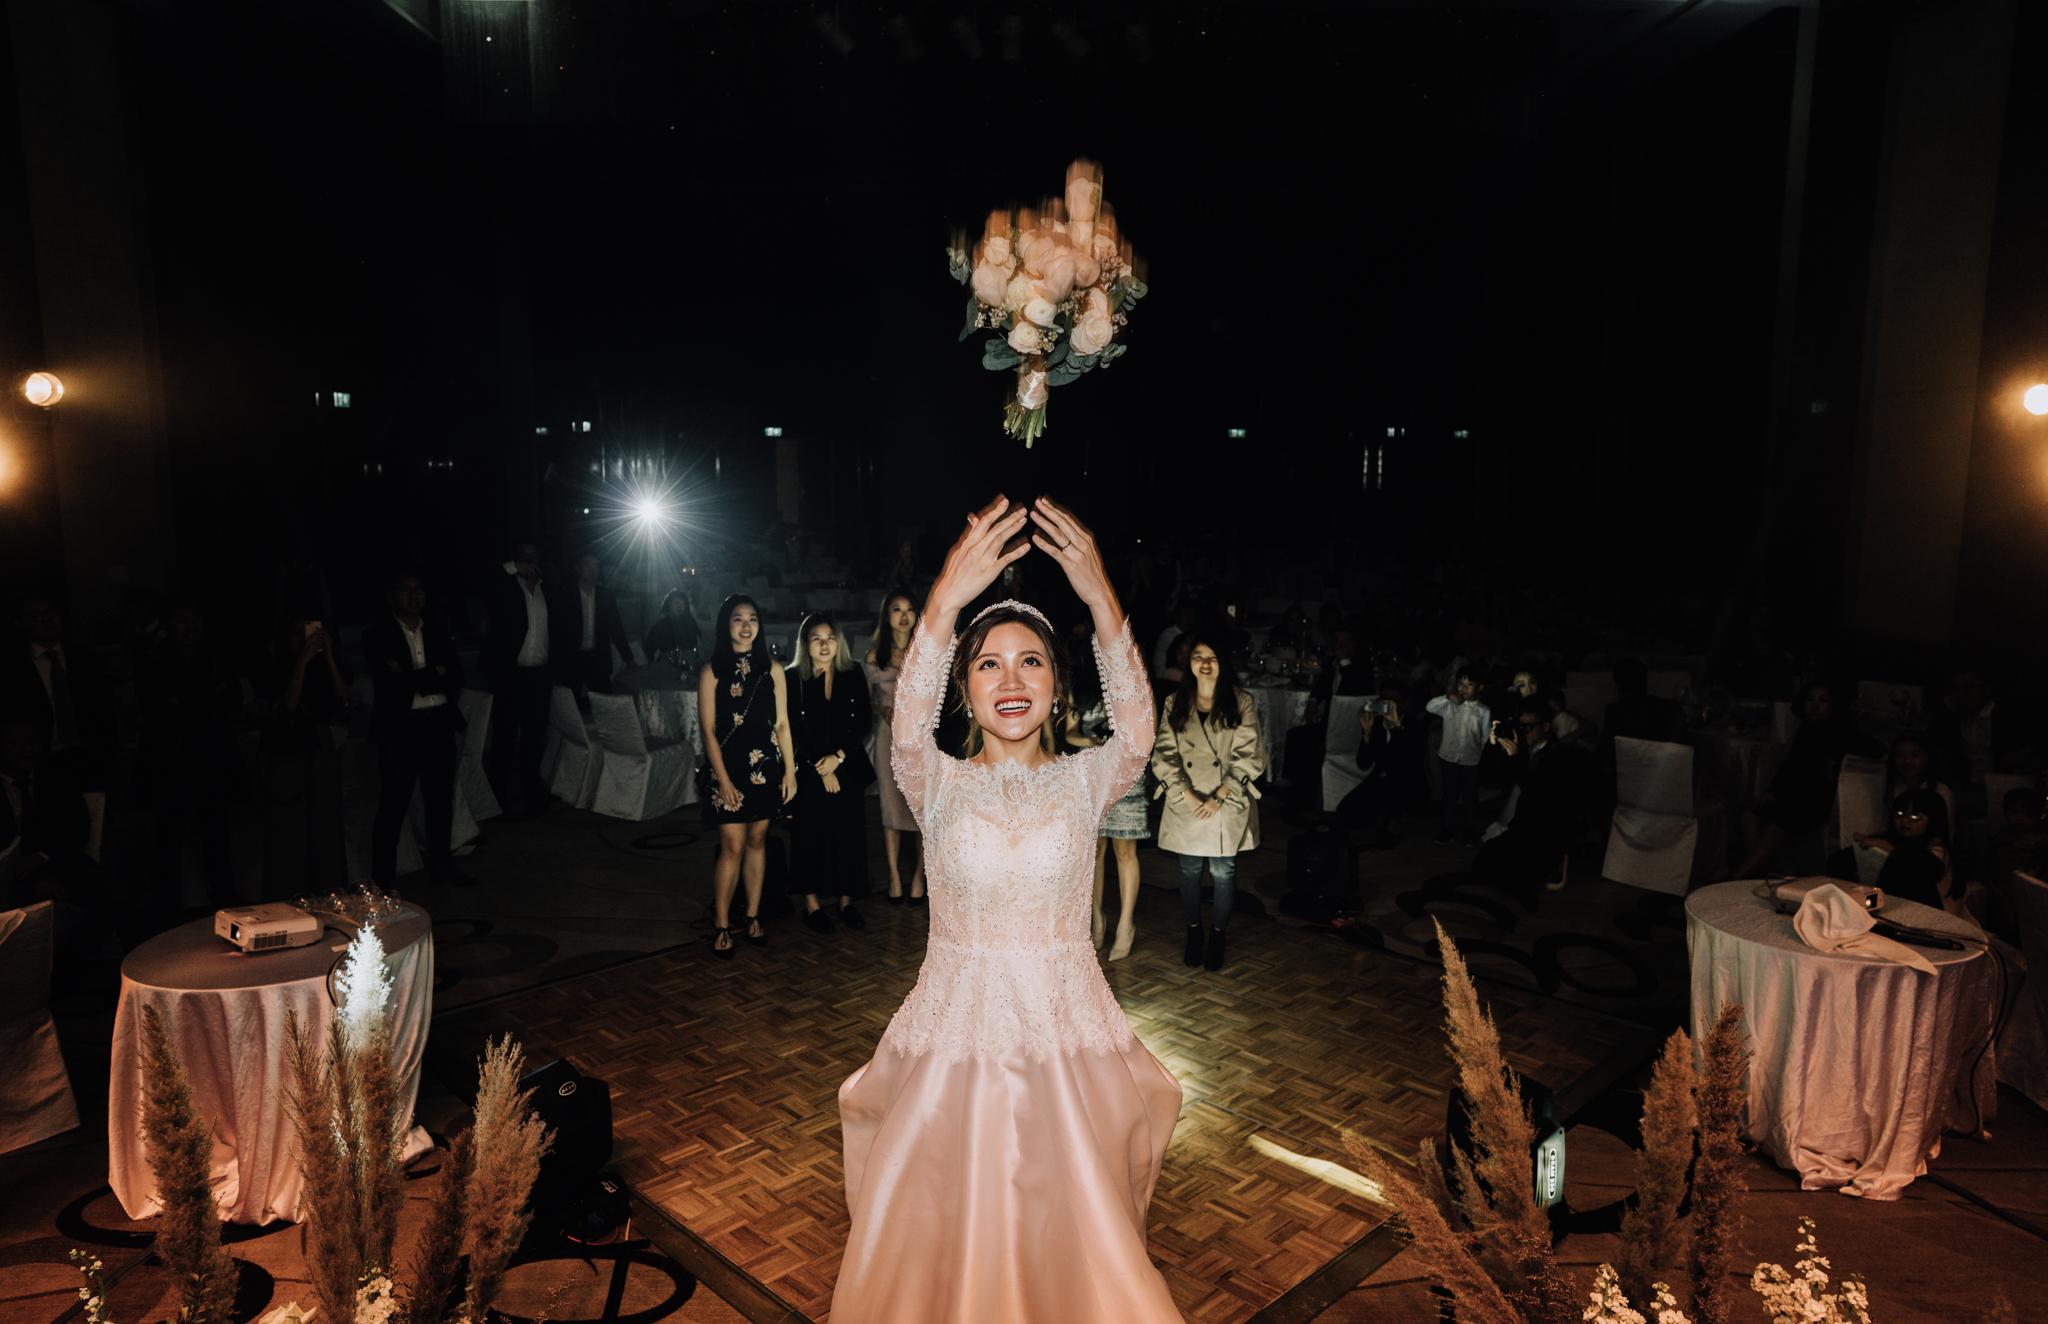 JWMarriott Ha Noi Intimate Wedding of Trang Hi well captured by Hipster Wedding Vietnam Wedding Photographer-36625.jpg